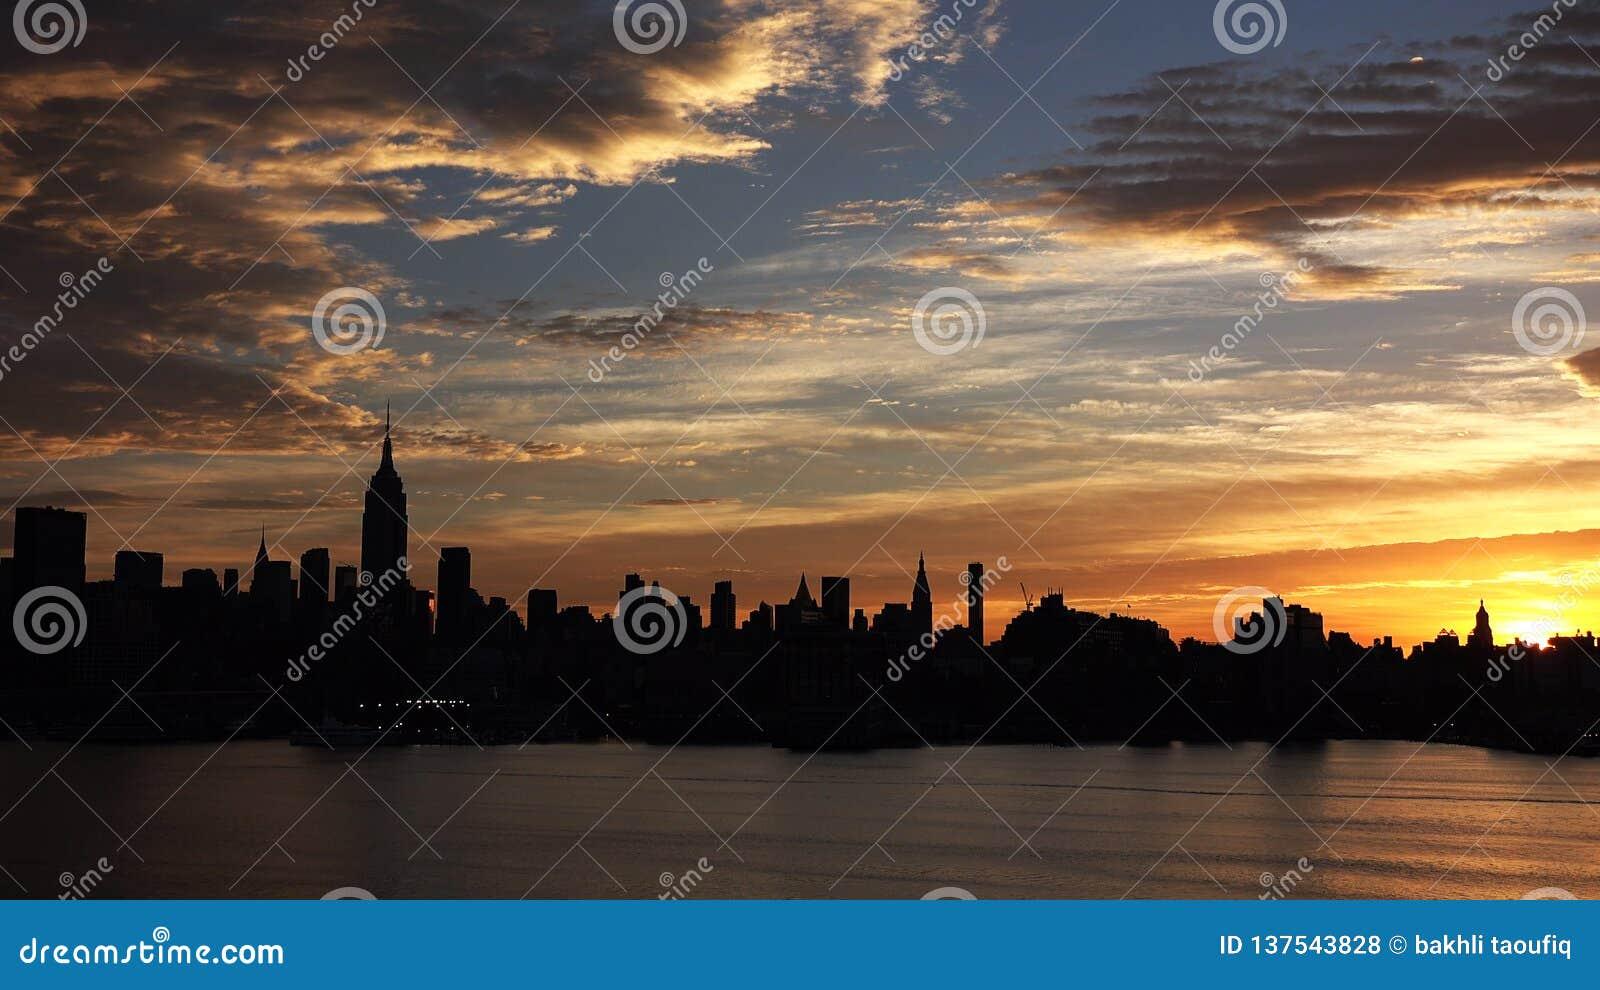 Горизонт Нью-Йорка с городскими небоскребами на заходе солнца HD